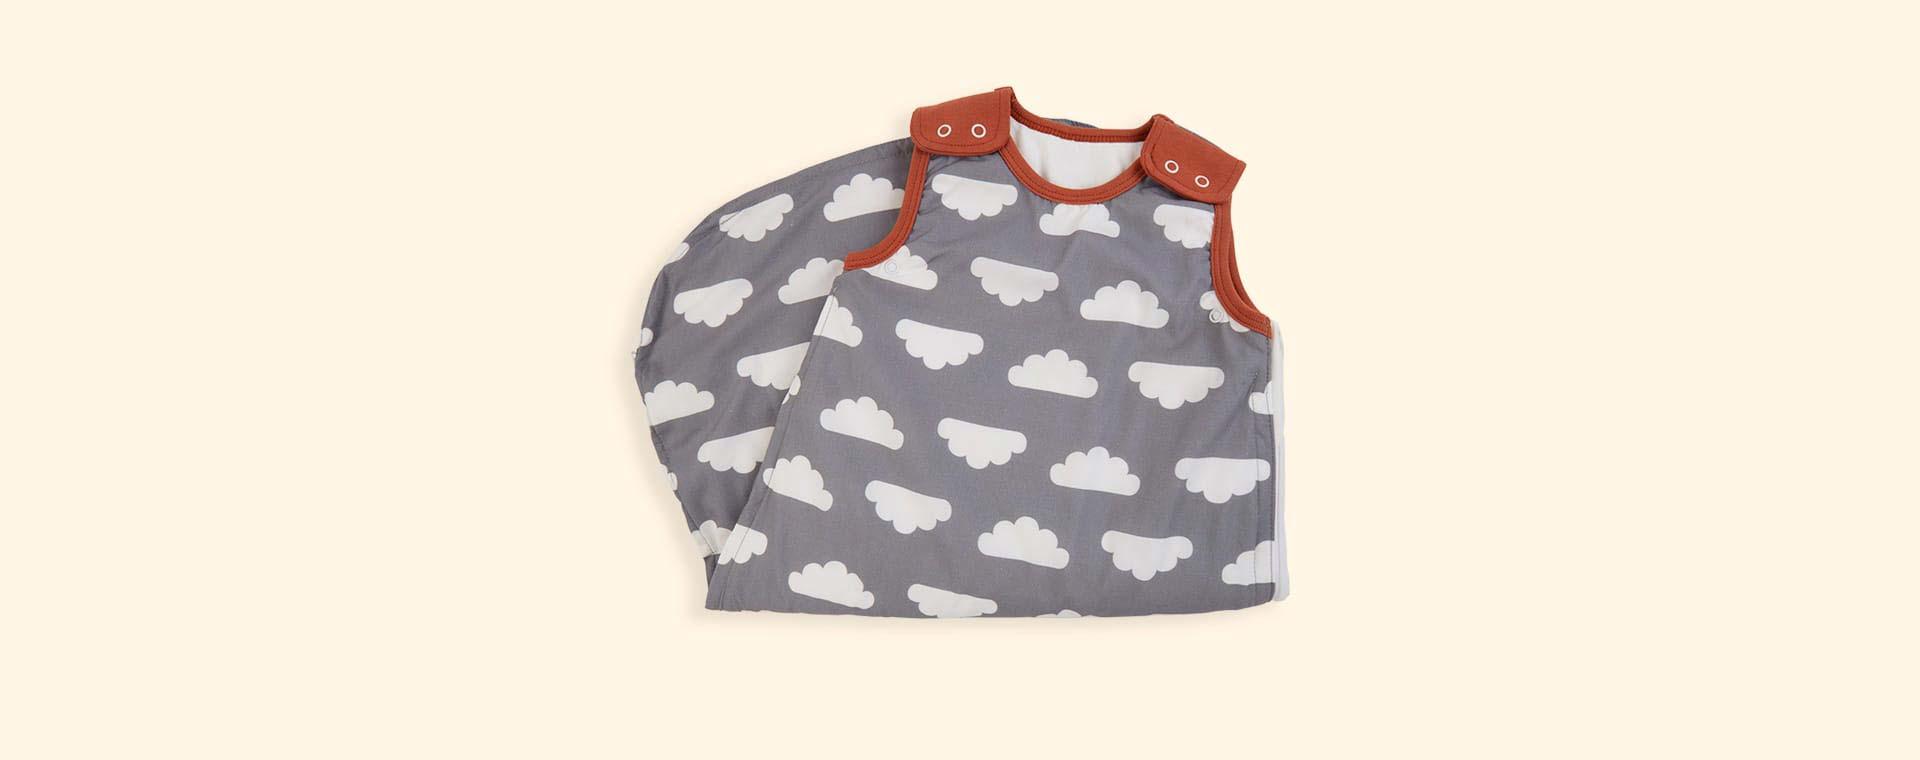 Rust Mama Designs Babasac Multi Tog Sleeping Bag